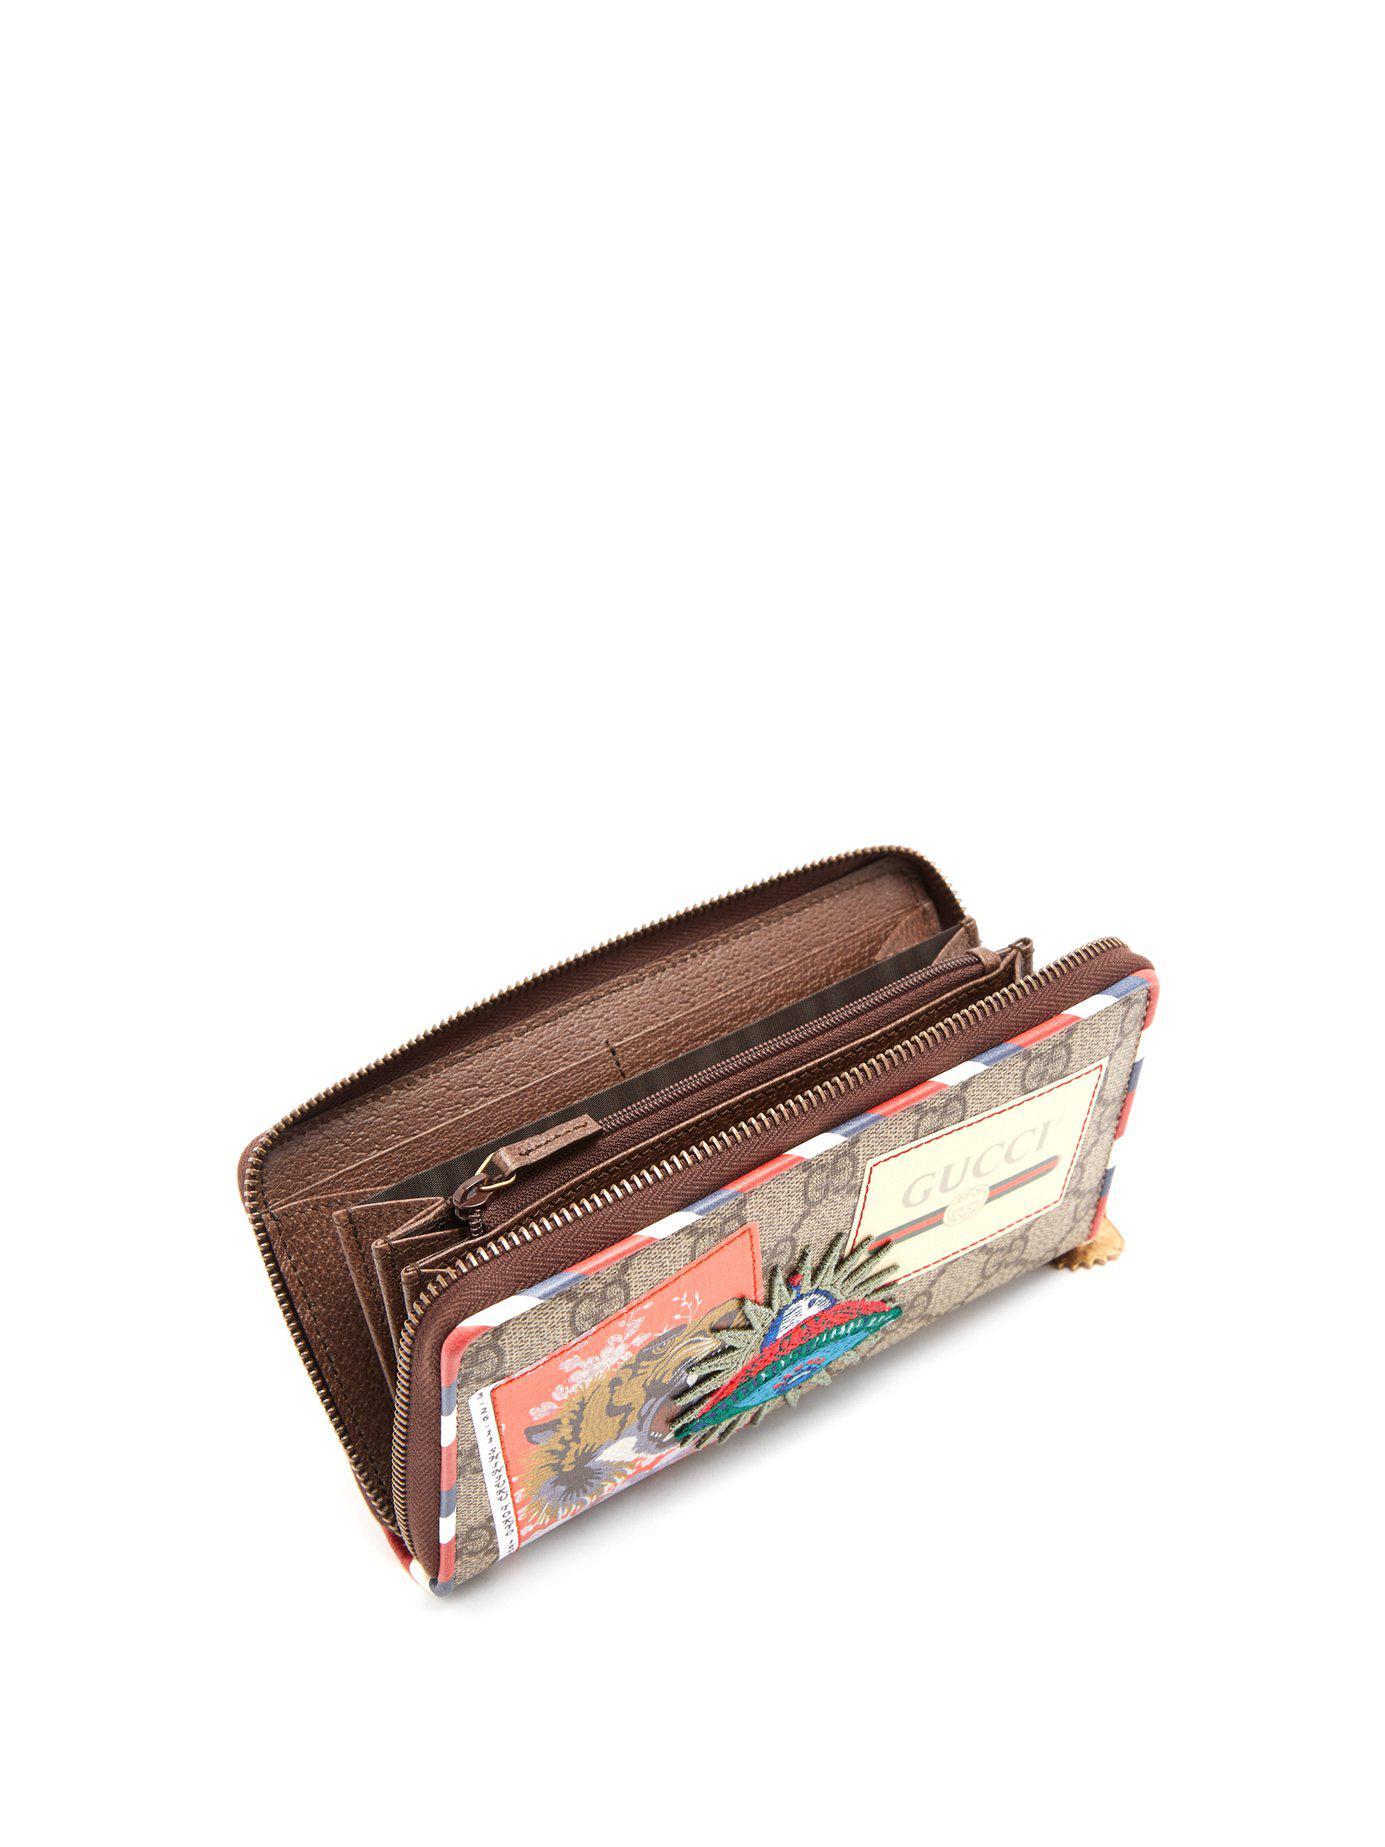 e9390b3f321ffd Gucci Courrier Gg Supreme Zip-around Wallet in Brown for Men - Save 5% -  Lyst